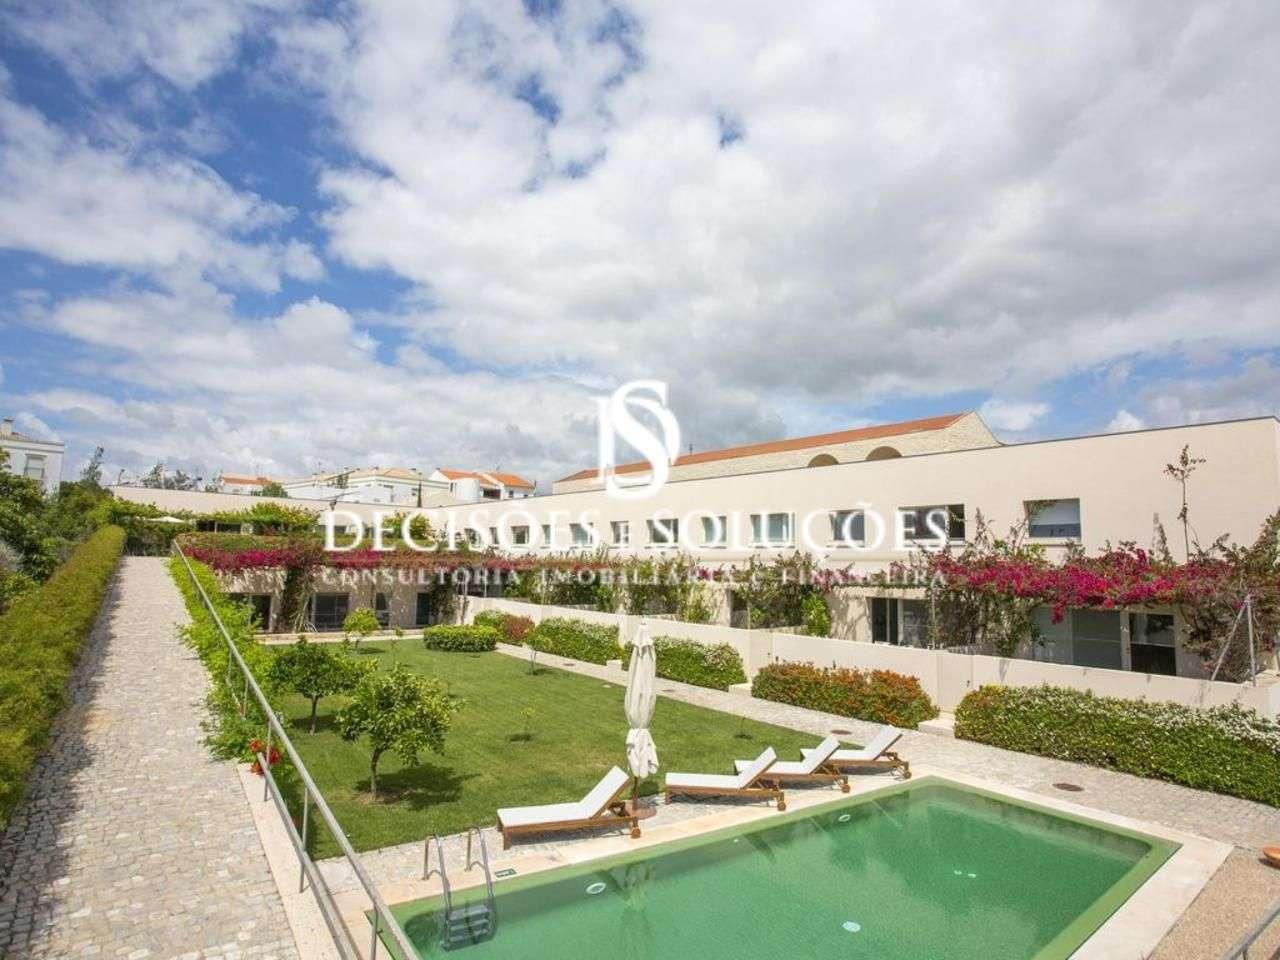 Apartamento para comprar, Tavira (Santa Maria e Santiago), Tavira, Faro - Foto 1